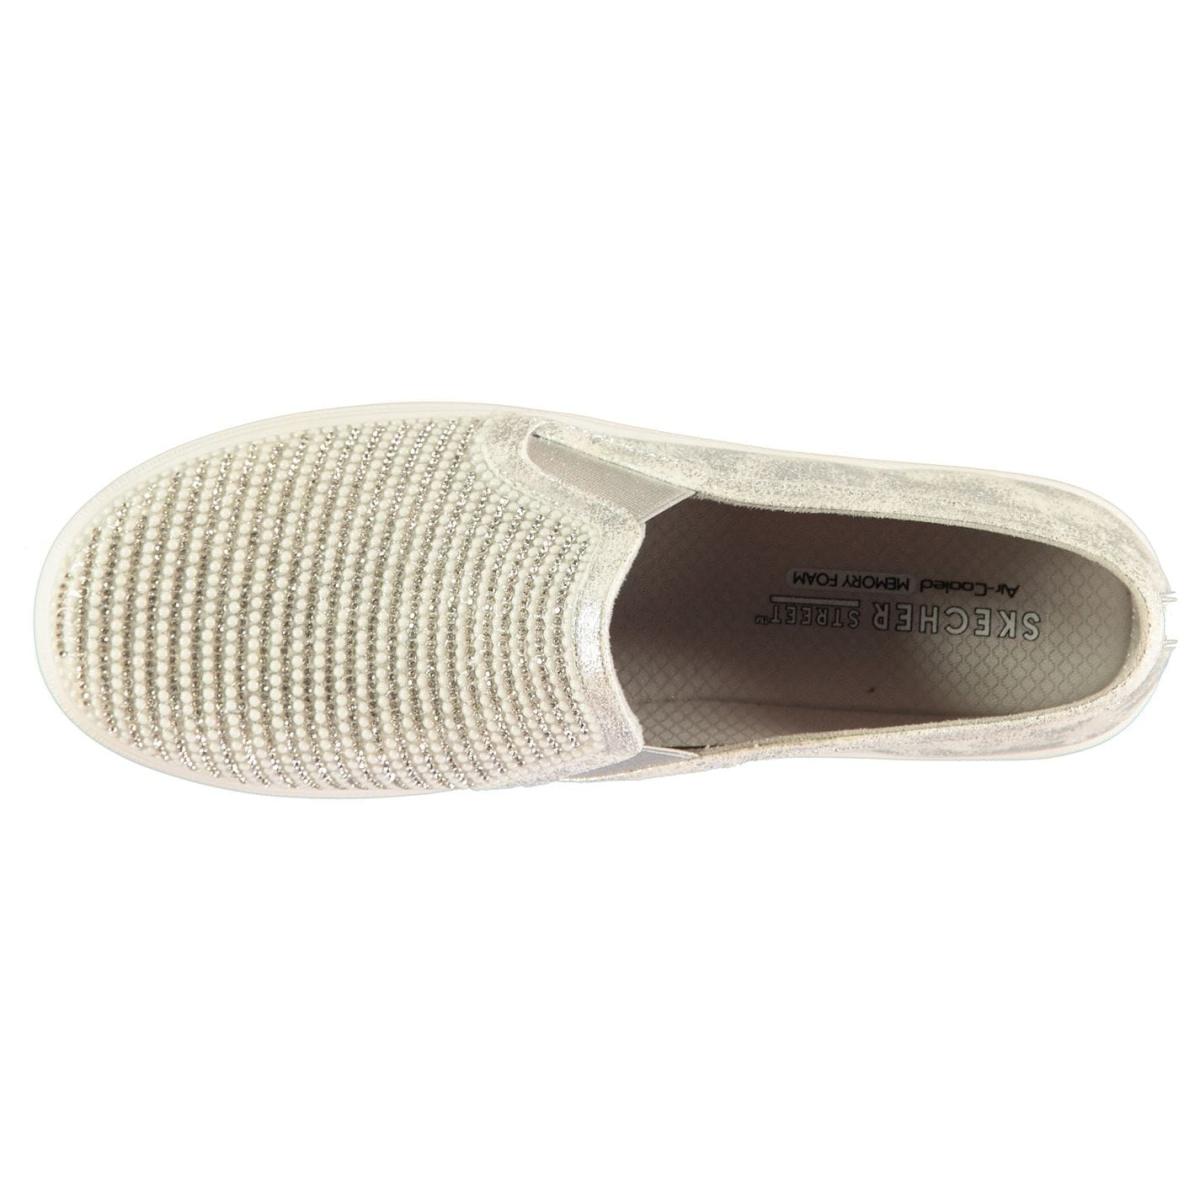 Skechers-Damen-Turnschuhe-Laufschuhe-Sneakers-Sportschuhe-Du-Shiny-4473 Indexbild 7